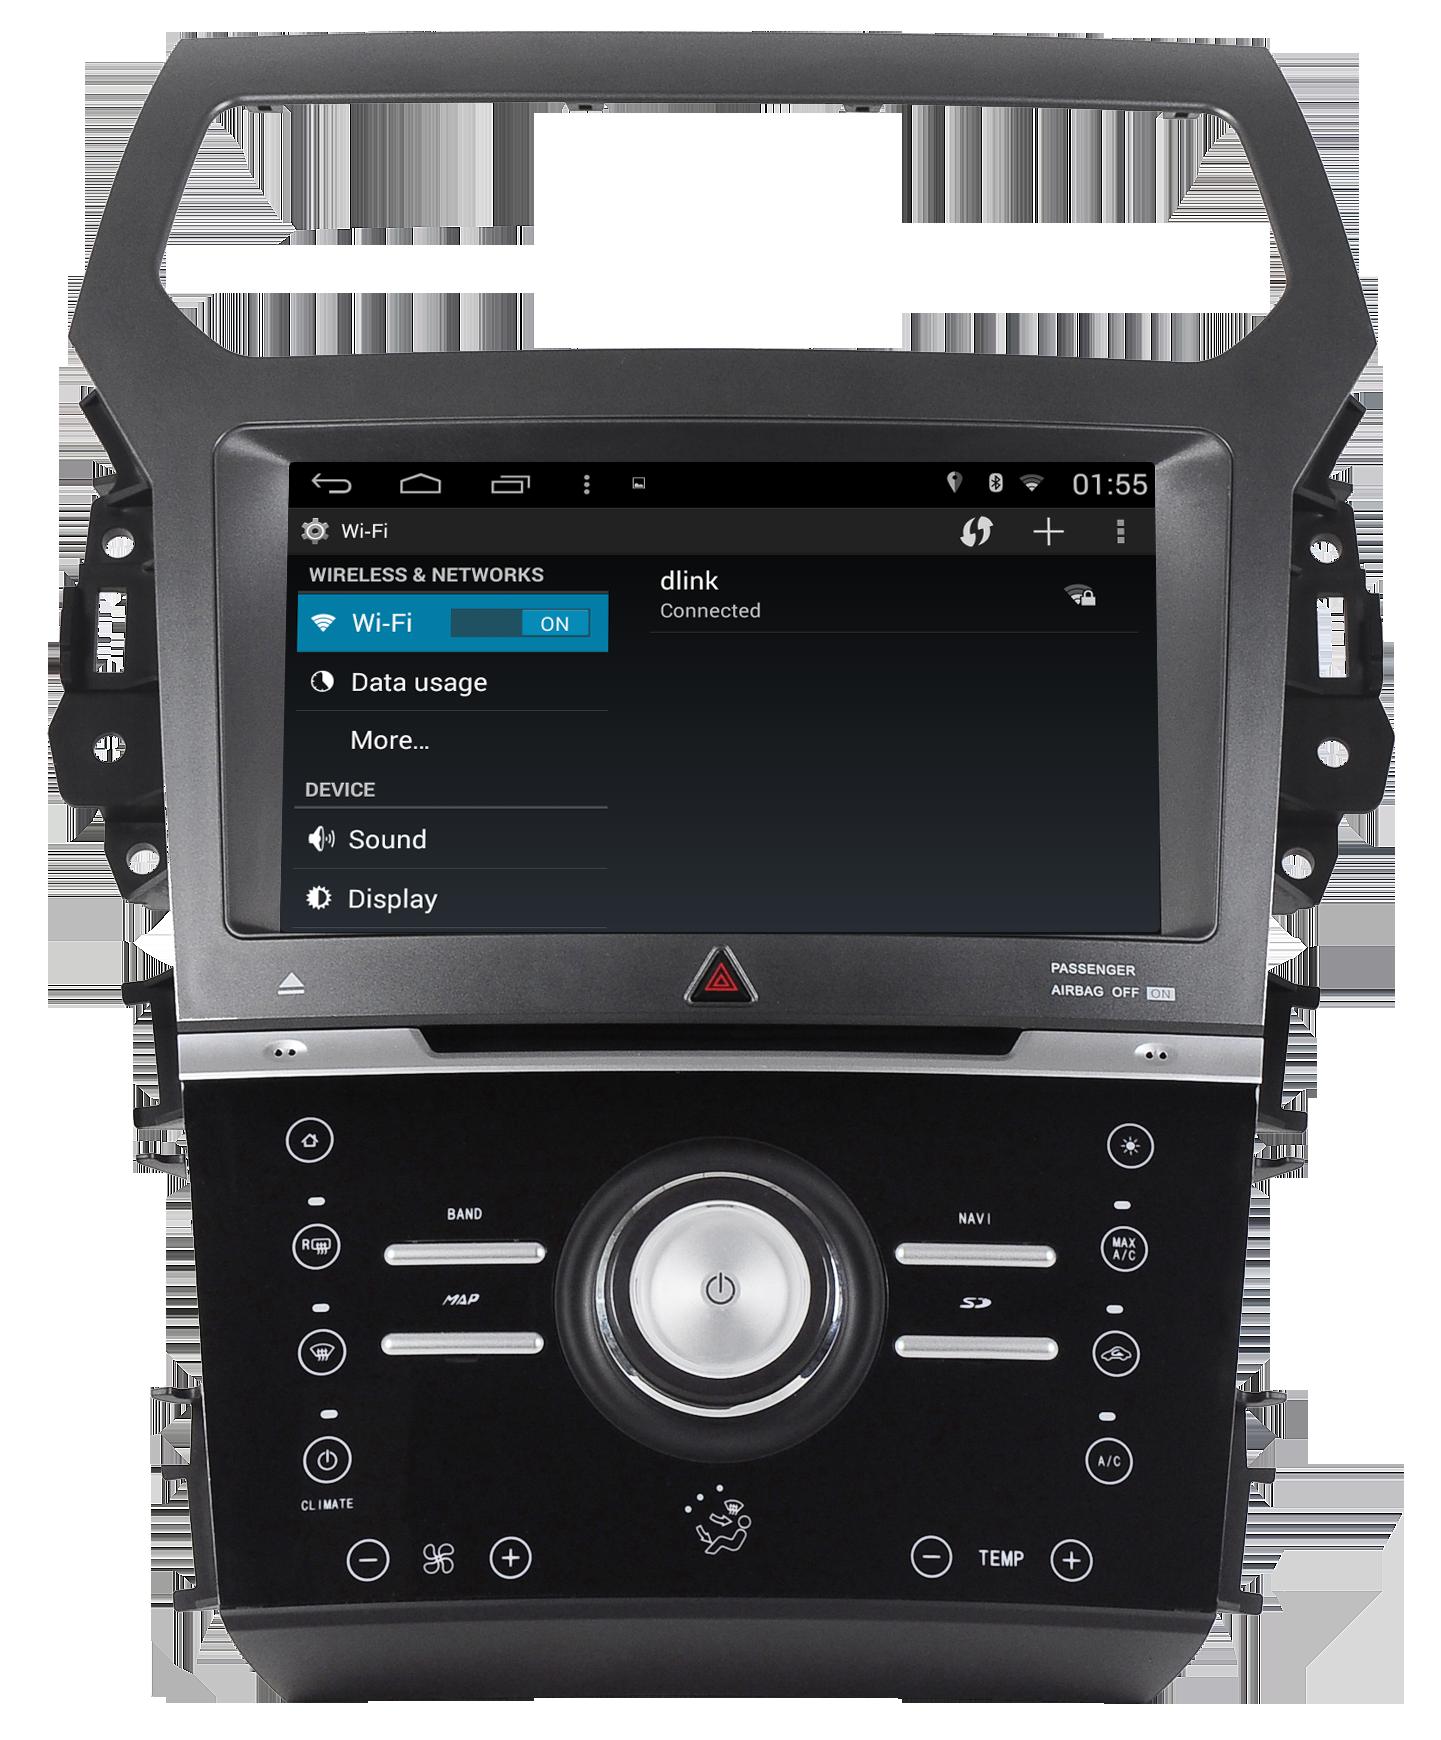 Autoradio gps bluetooth ford explorer 2012 2015 android camera de recul commande au volant ipod tv dvbt 3g 4g pas cher wifi poste usb sd tnt double 2 din canbus iphone samsung www